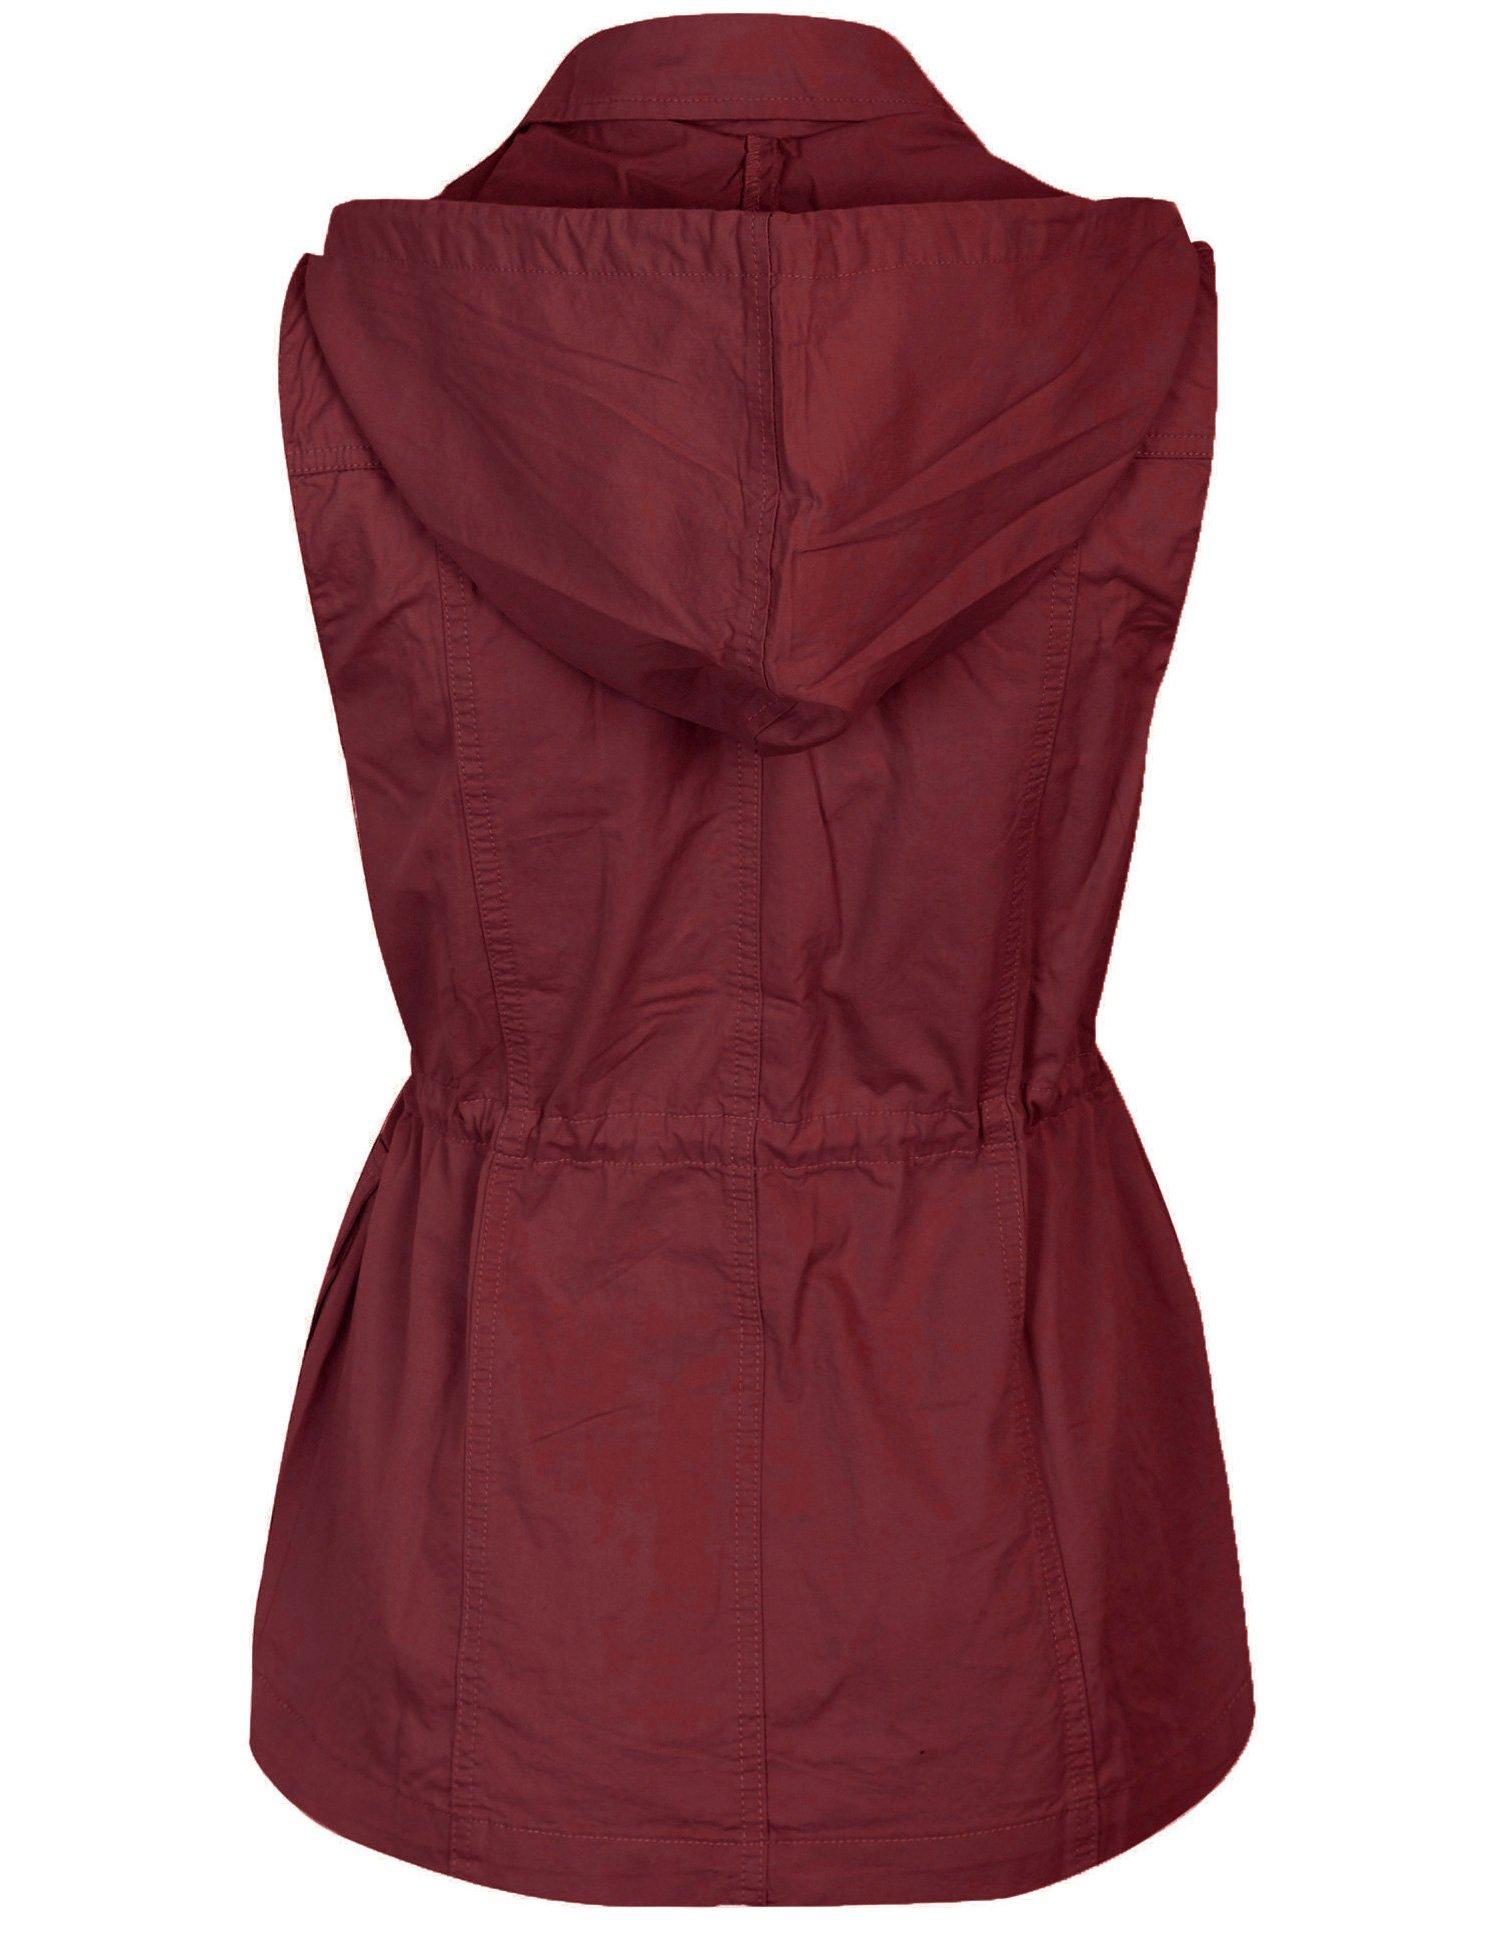 KOGMO Womens Military Anorak Safari Utility Vest with Hood-3X-WINE by KOGMO (Image #3)